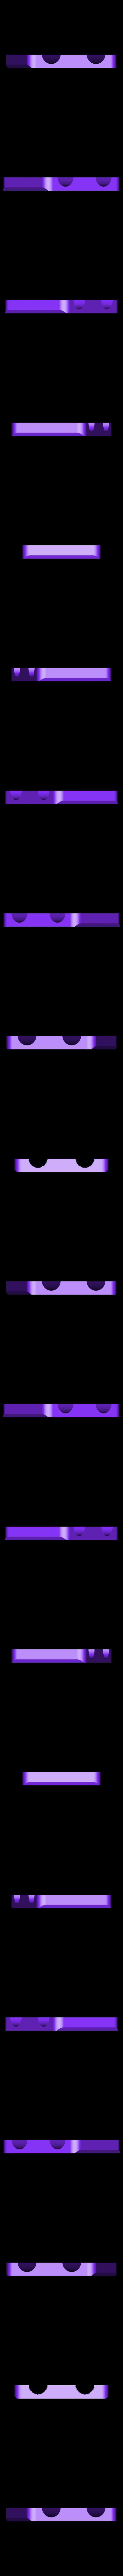 monstand_p4.bottom.stl Download free STL file Modular dual monitor stand • 3D printer object, _MSA_